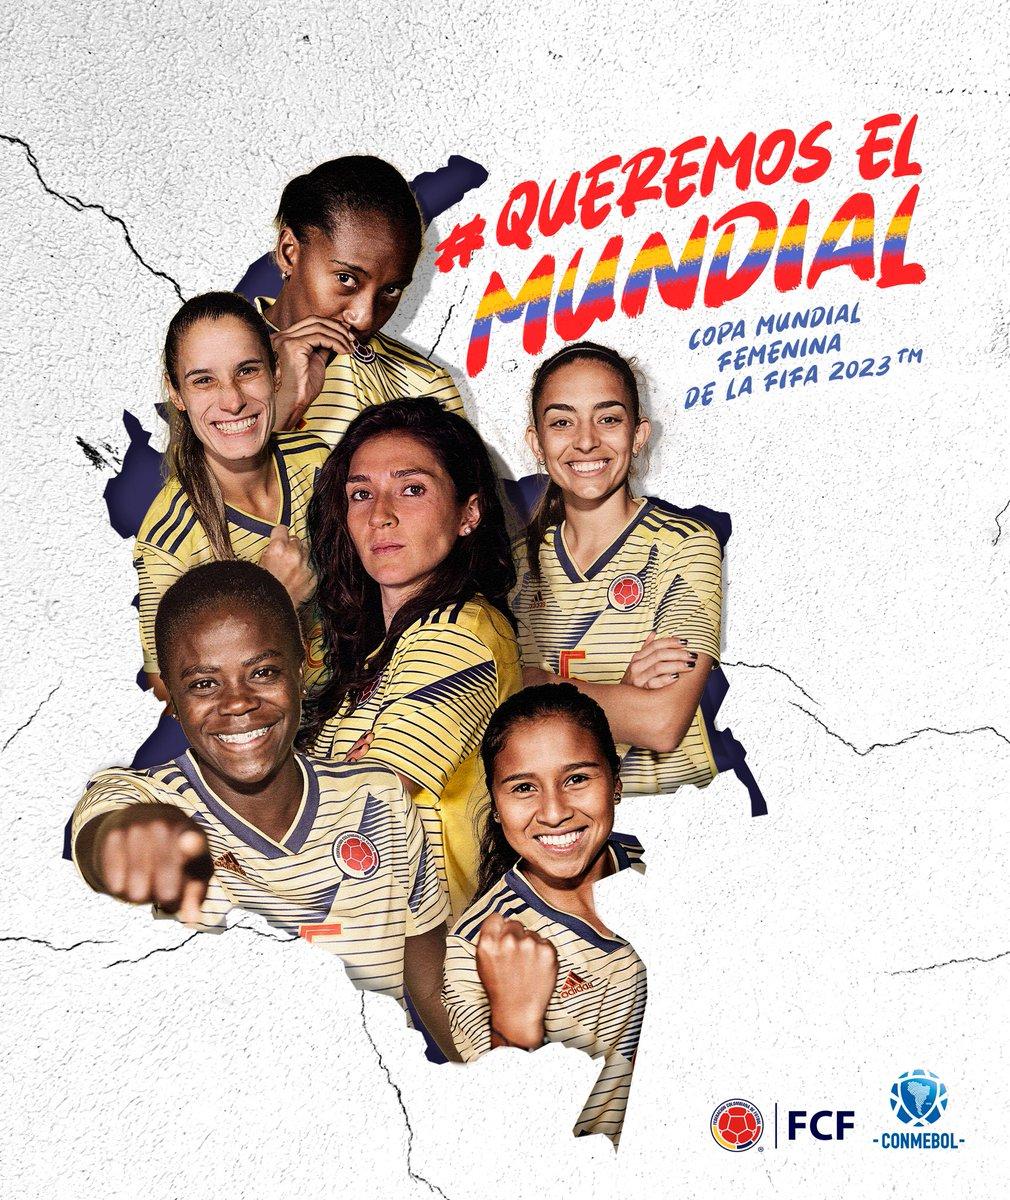 #QueremosElMundial para demostrarle al mundo que Colombia está lista para ser sede de un Mundial Femenino de la FIFA inolvidable 🇨🇴✌🏼 https://t.co/7mgOxdKJcX